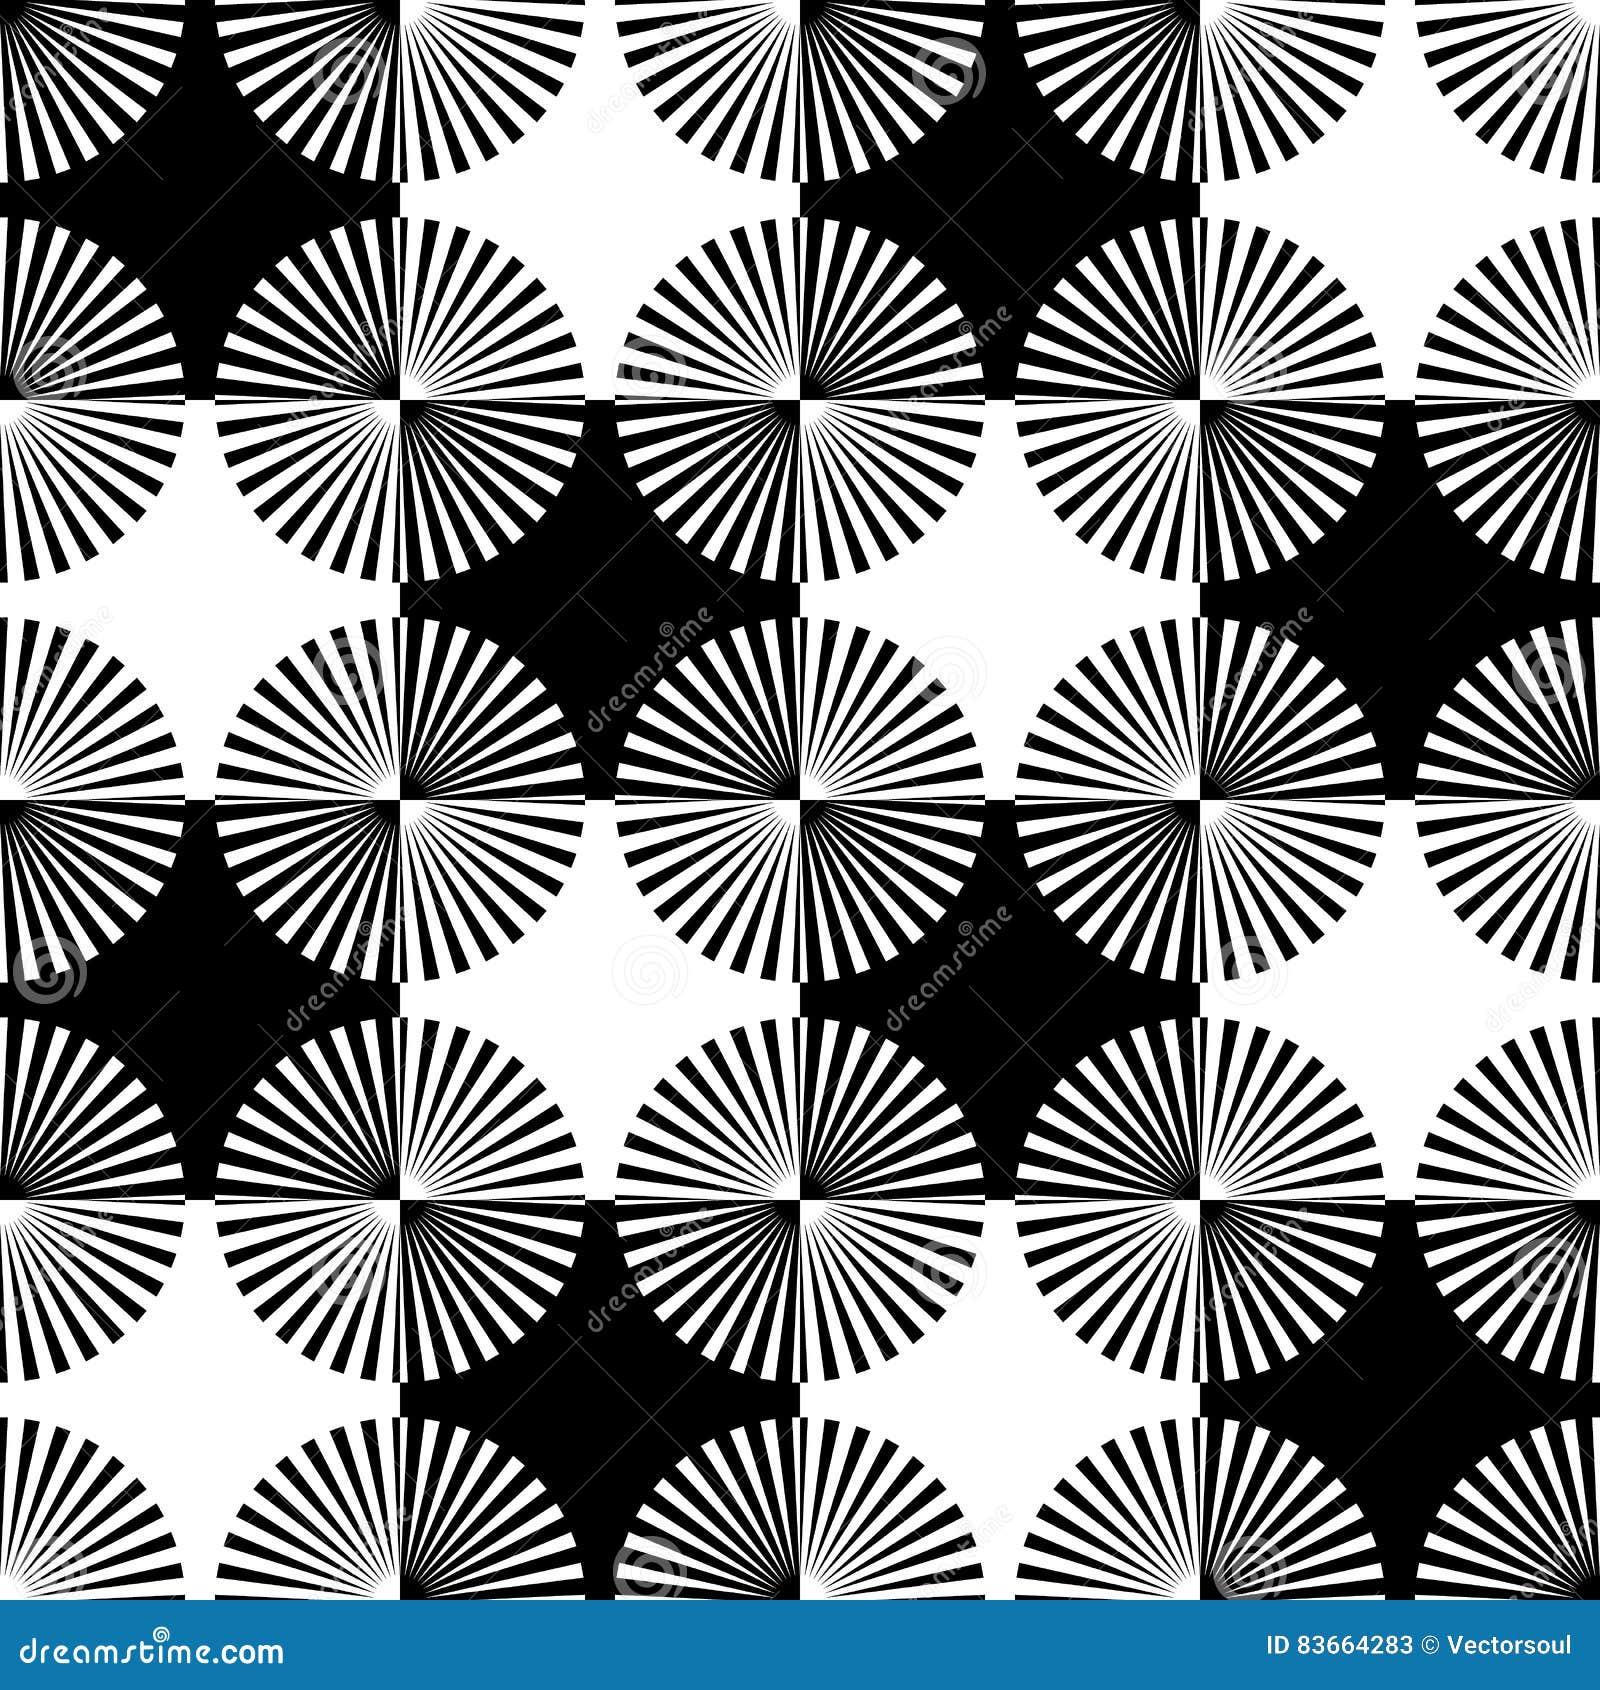 Starburst rays, beams seamless geometric pattern. Monochrome r